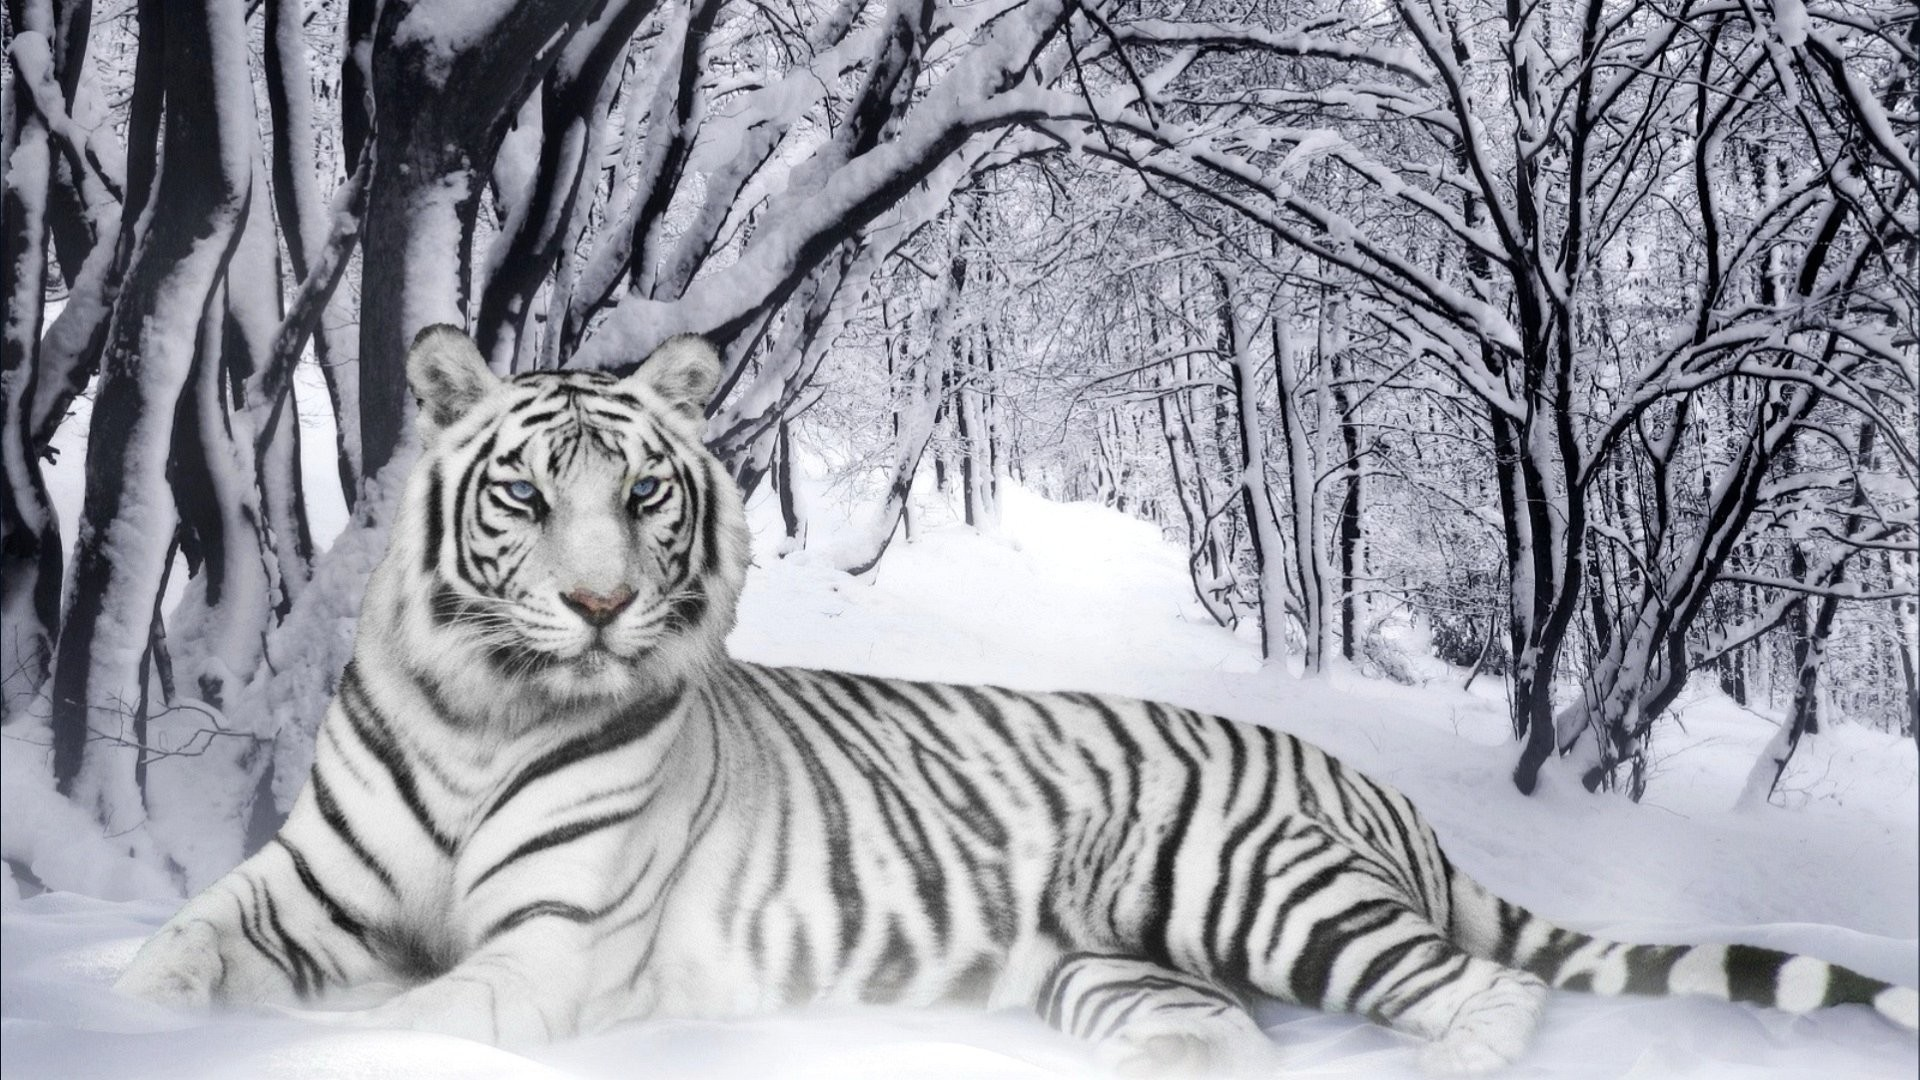 Winter HD Wallpapers Backgrounds Wallpaper 1920×1080 Winter Wallpapers Full  HD (37 Wallpapers)